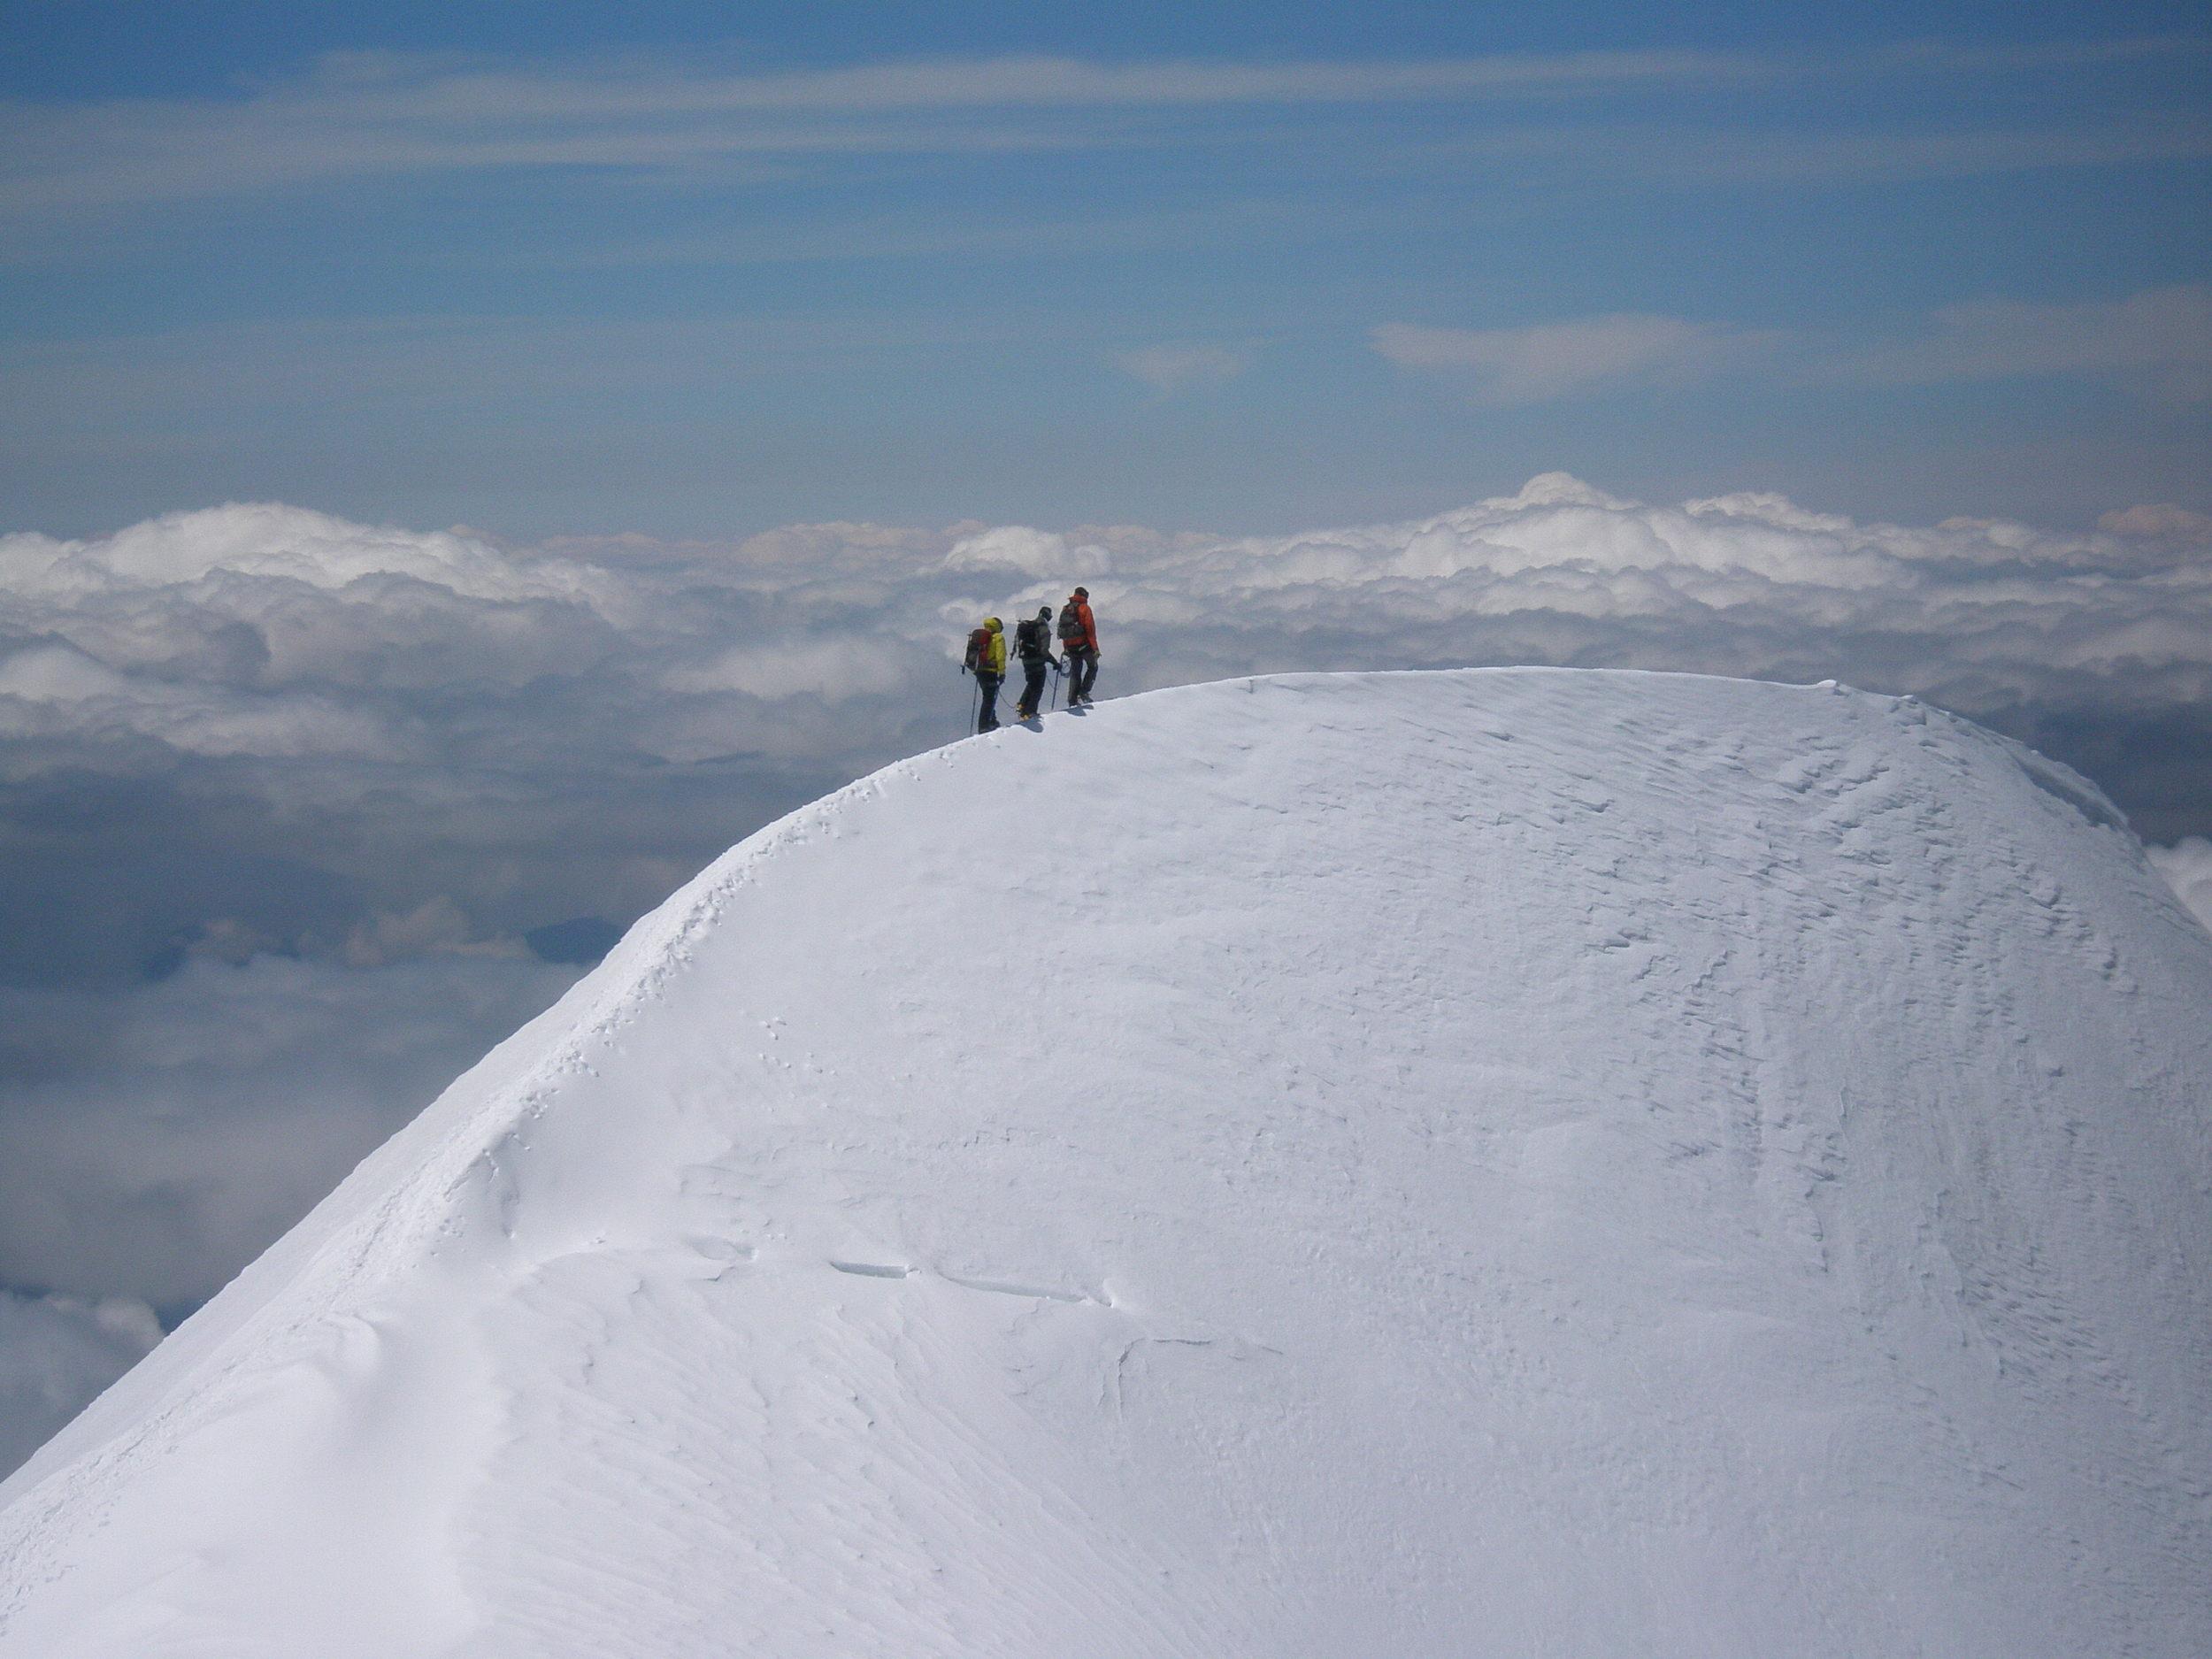 On the Bosses Ridge of Mont Blanc, France